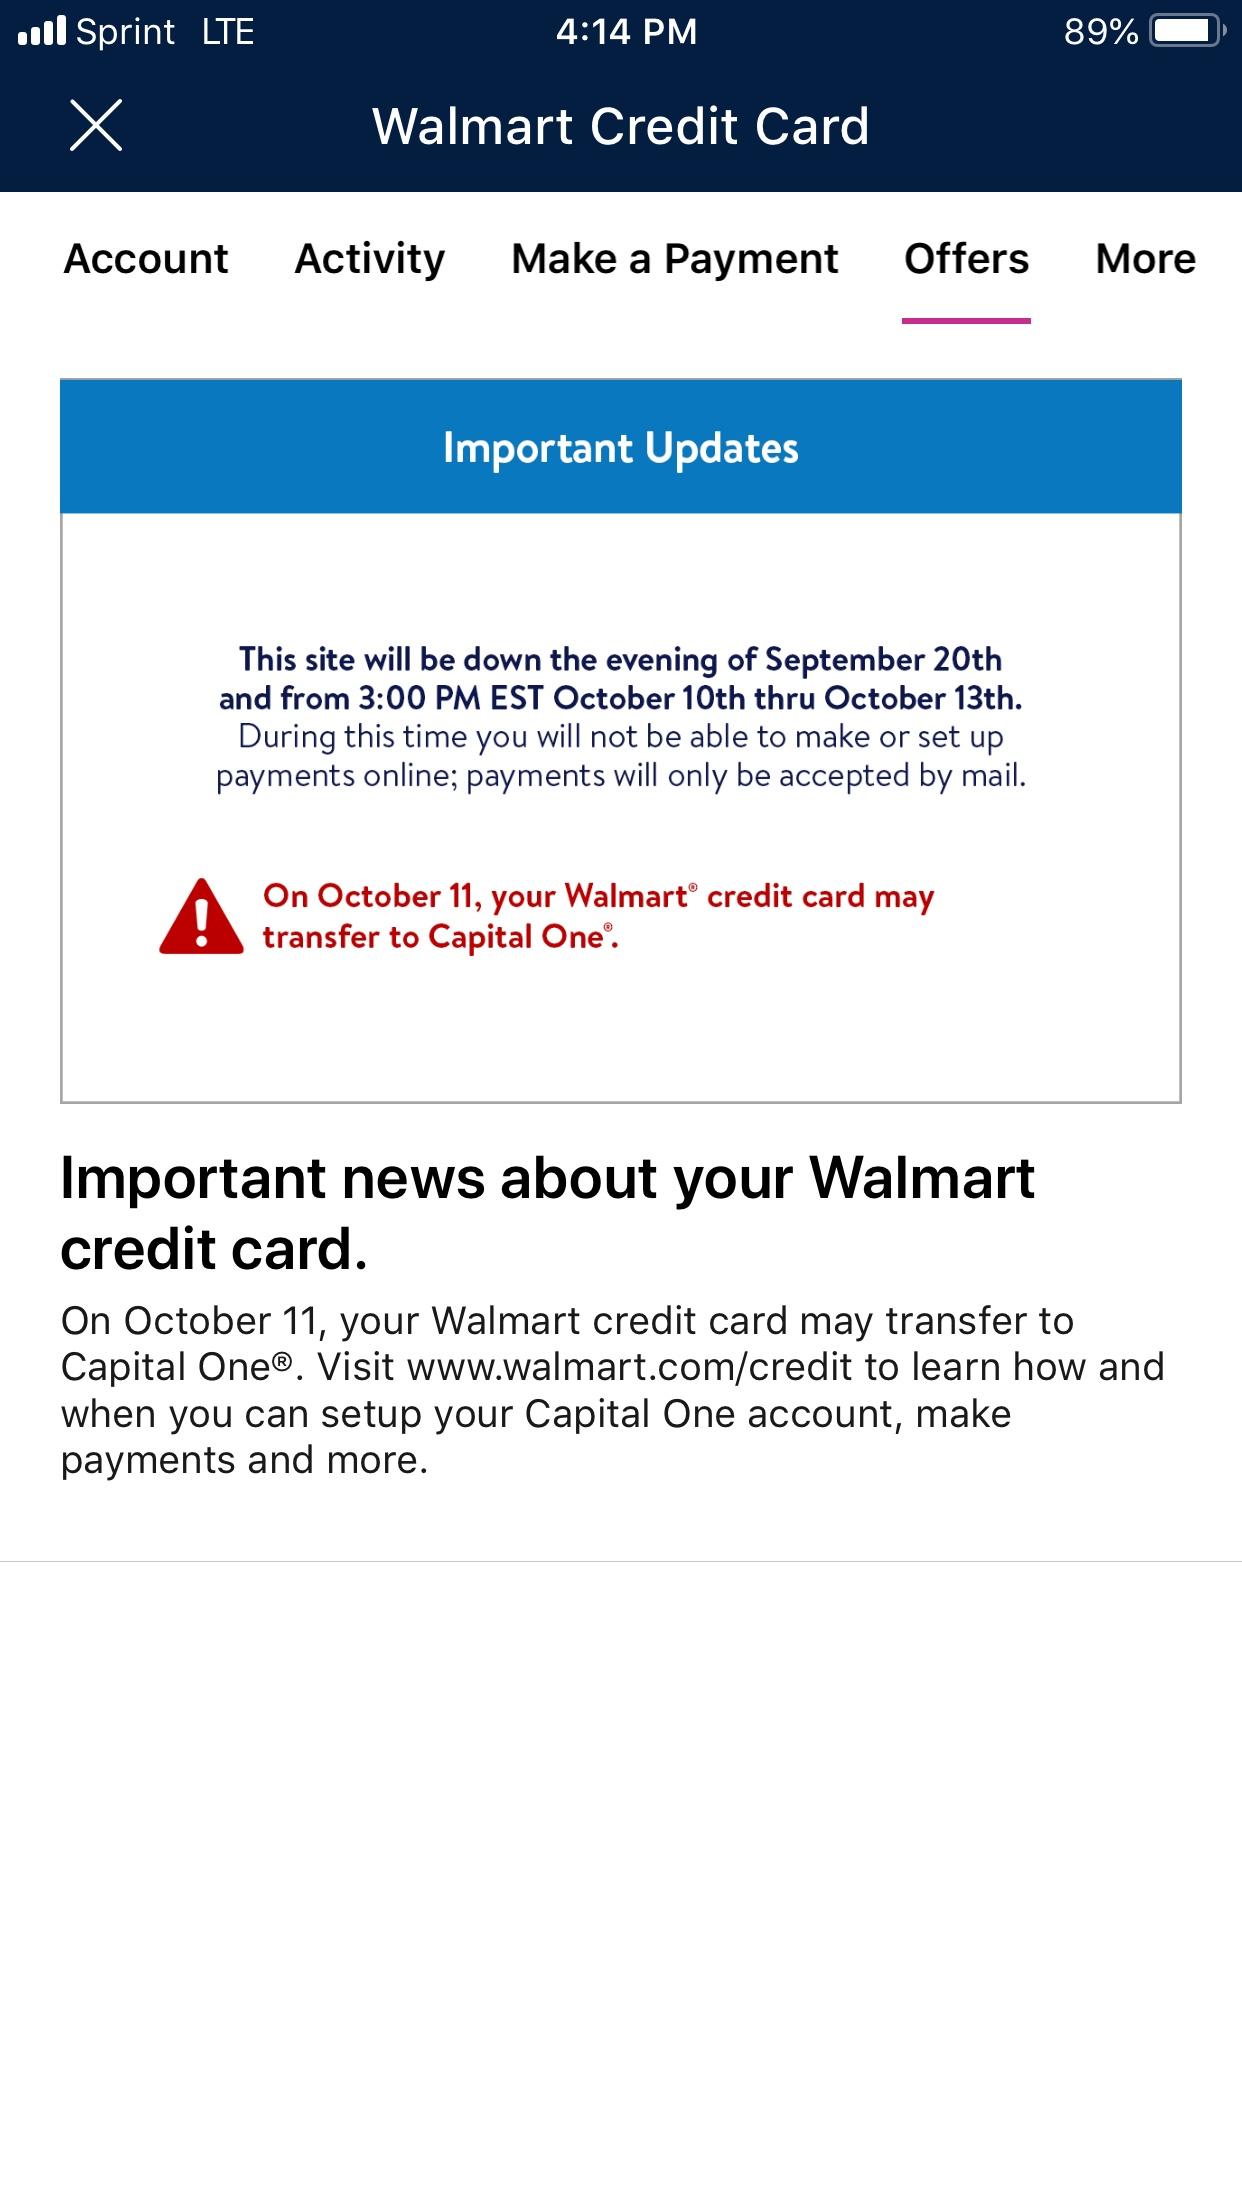 New Walmart Credit Partner - myFICO® Forums - 5402339